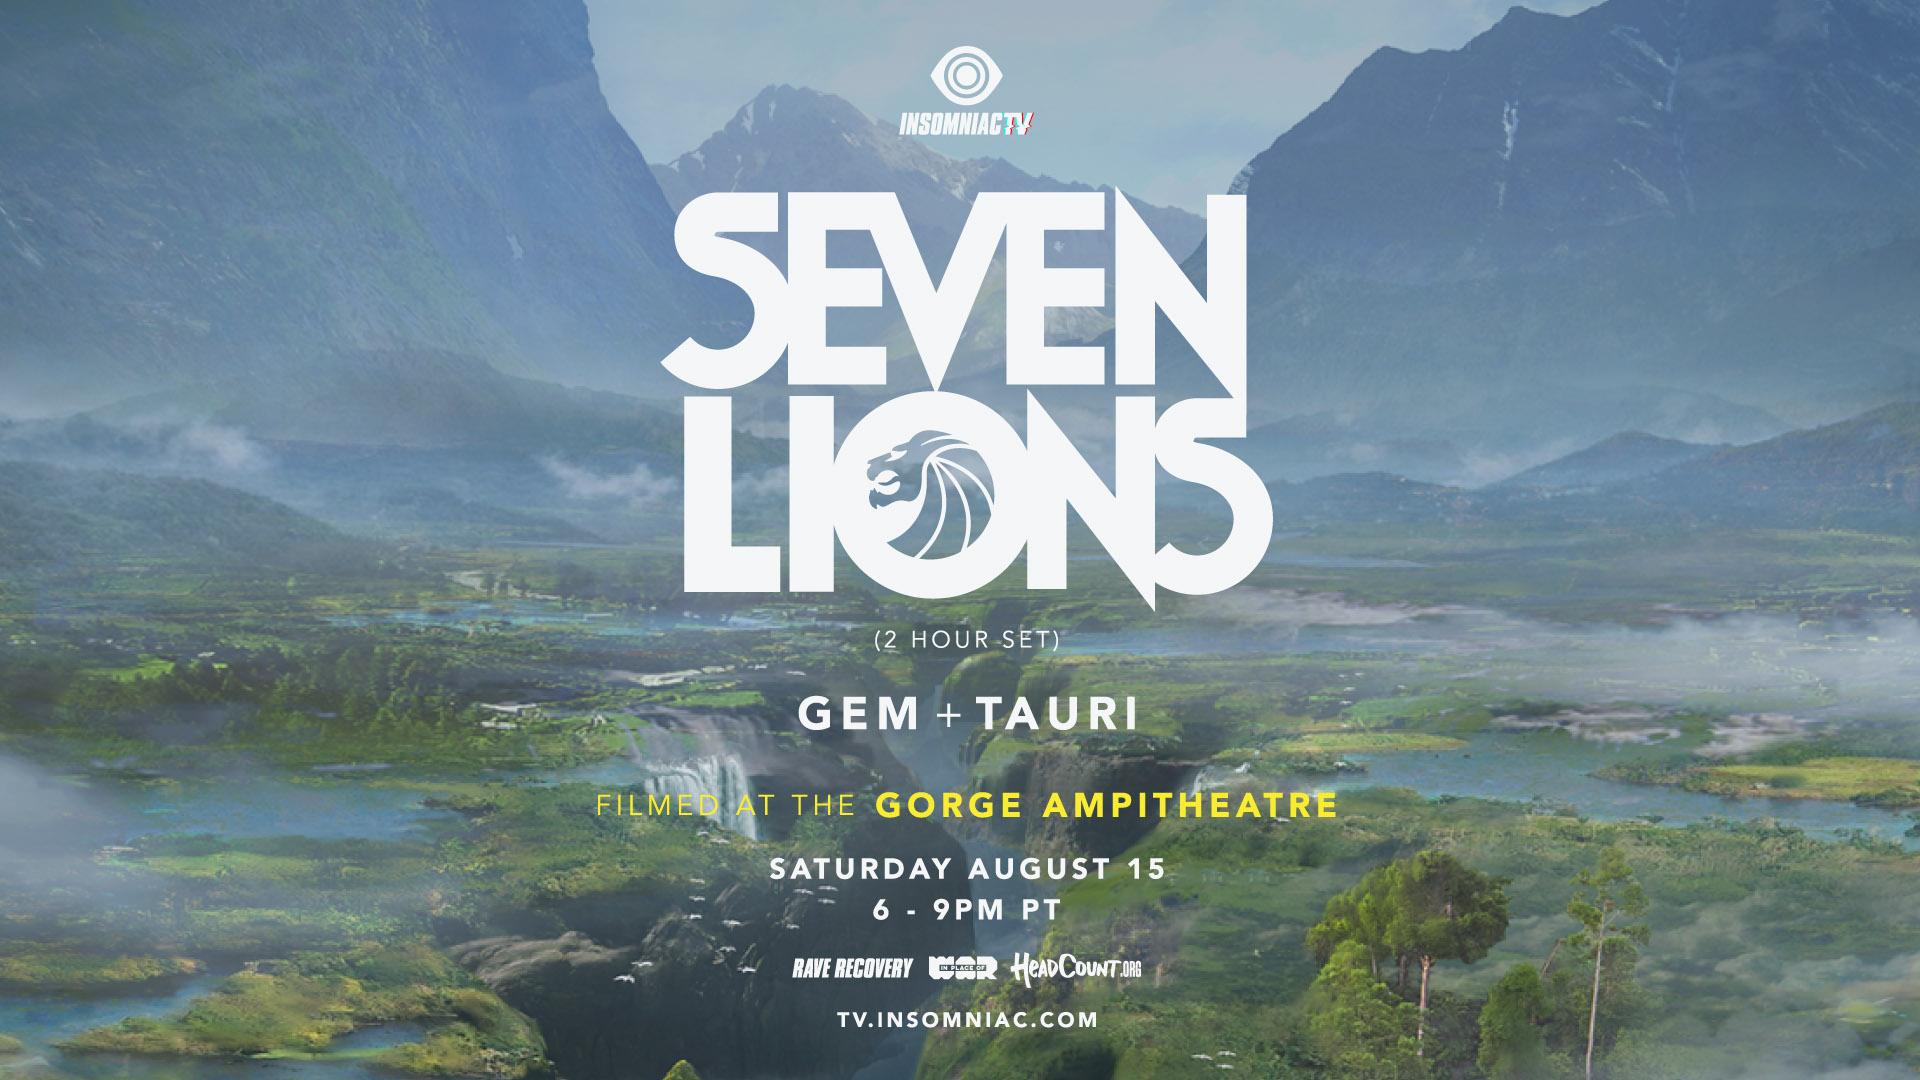 Seven Lions + Insomniac